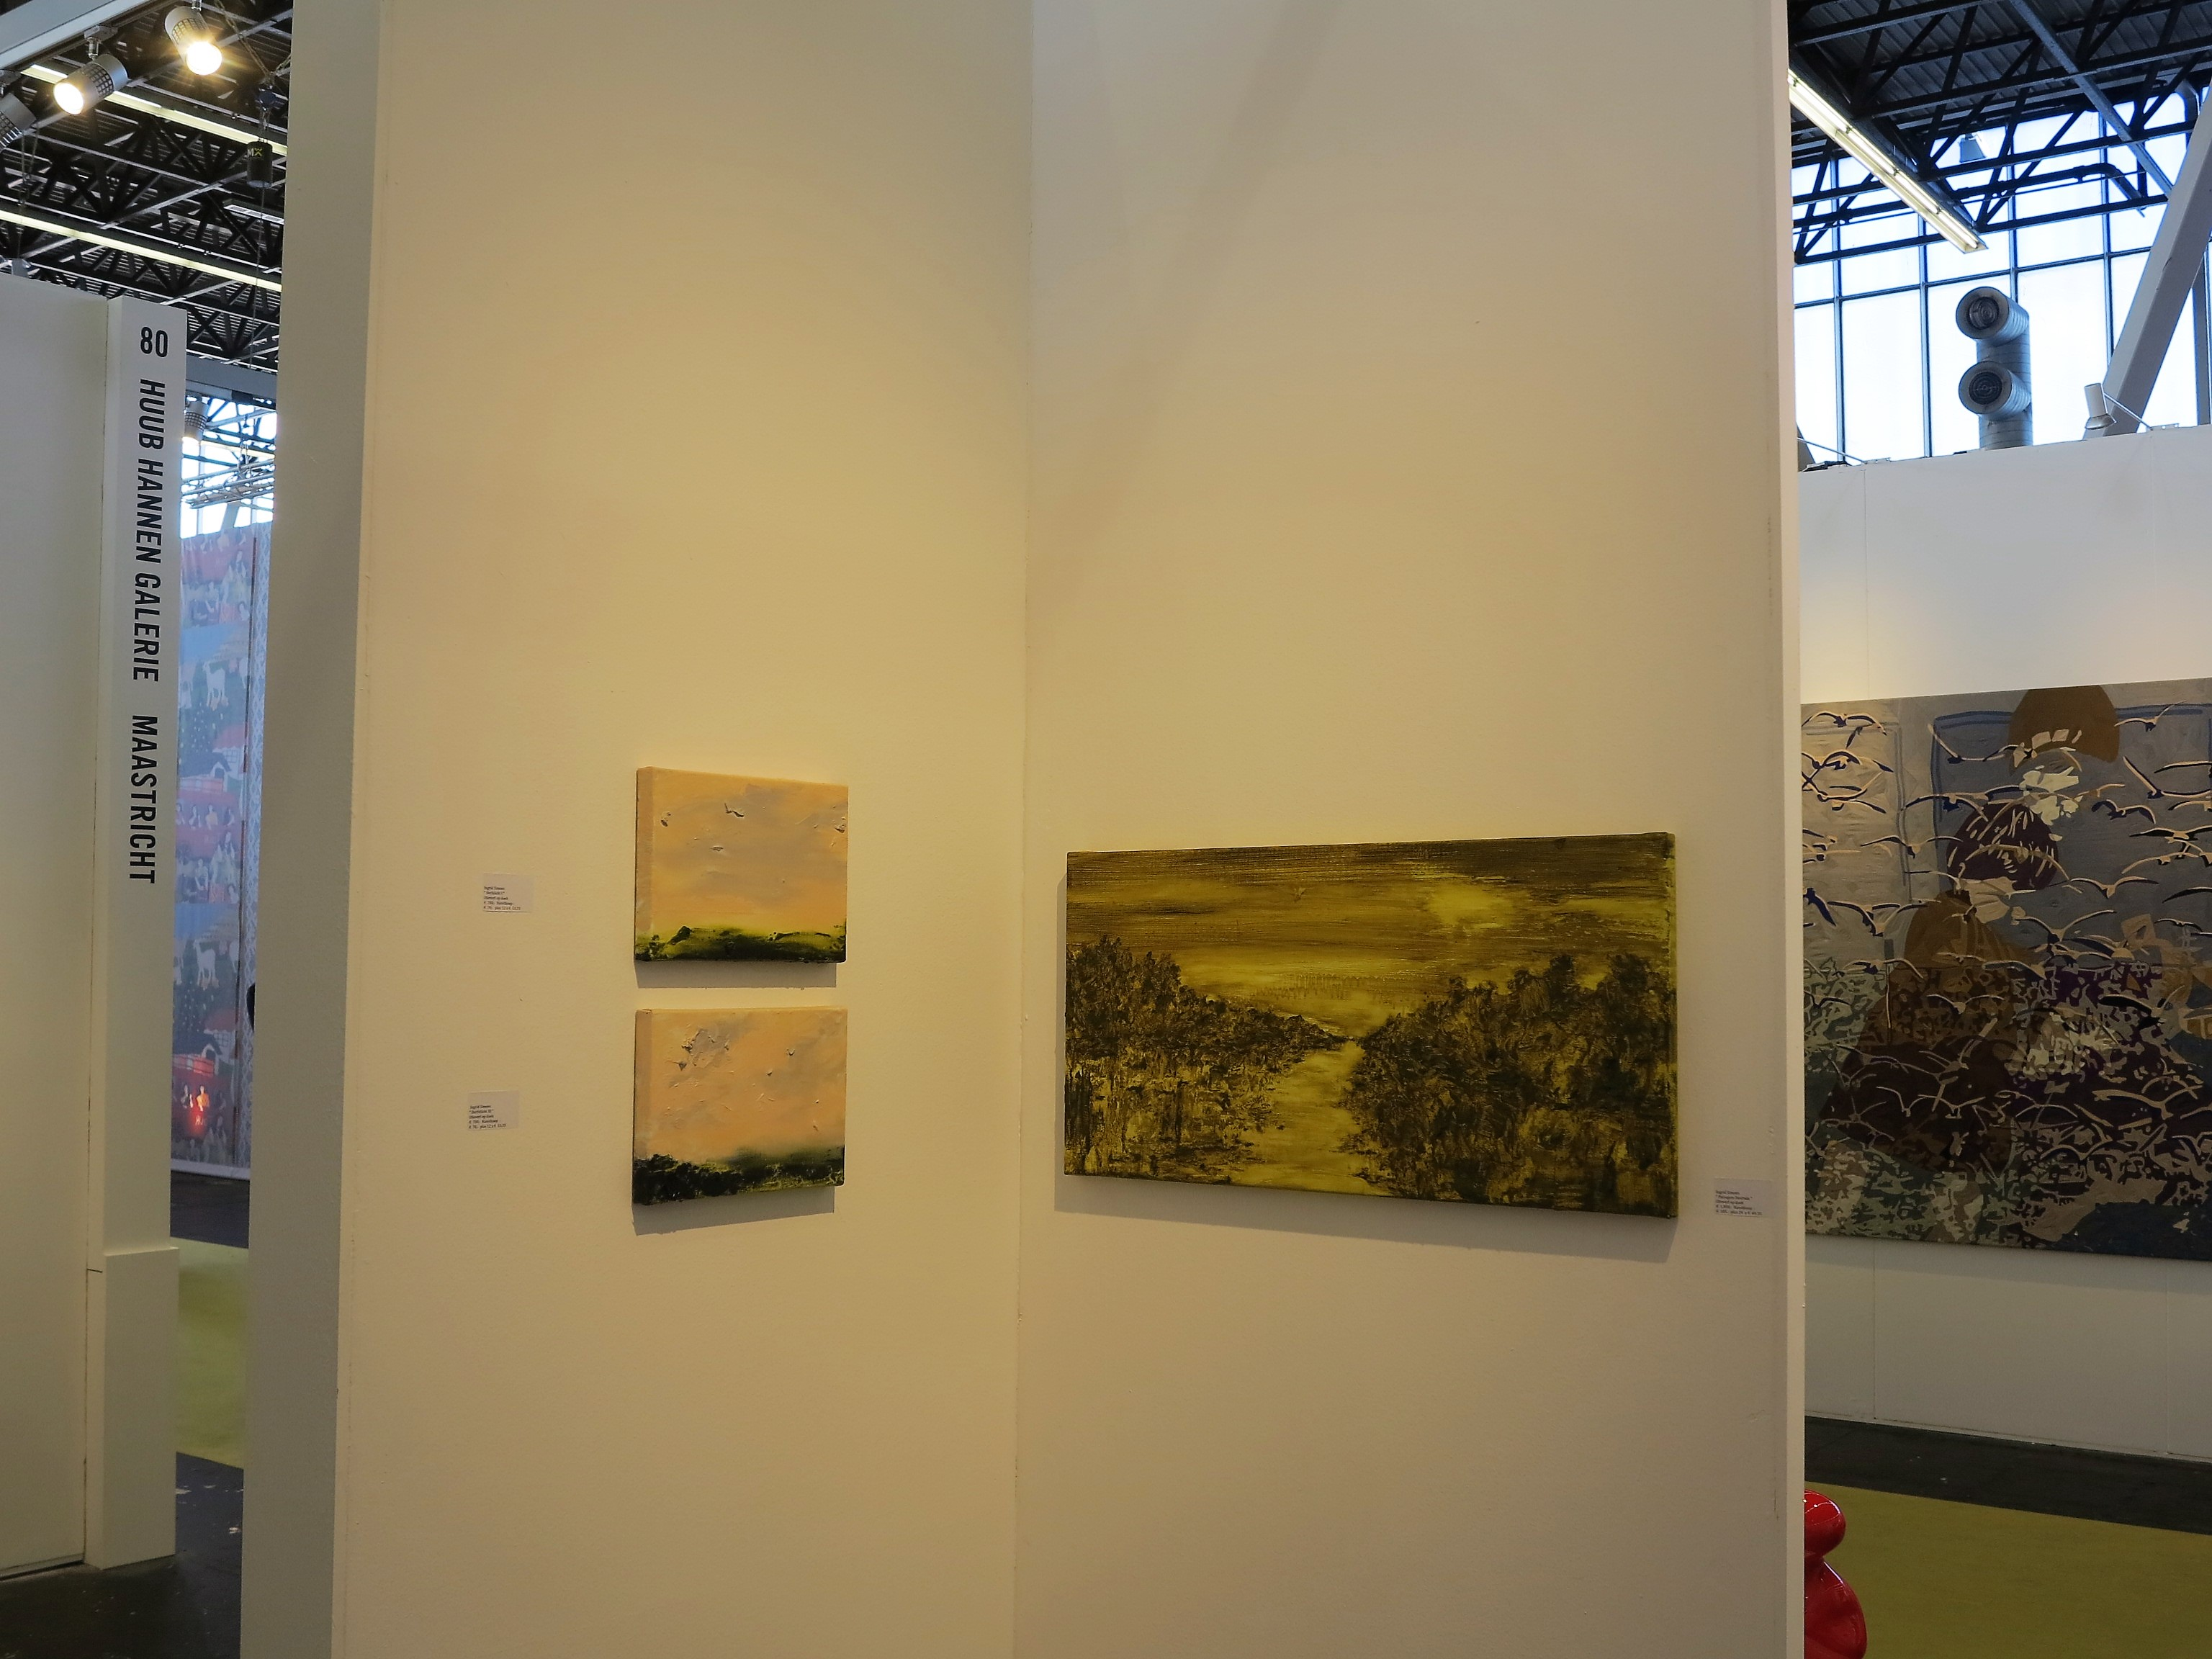 KunstRAI, Huub Hannen Galerie, RAI Amsterdam (2018)